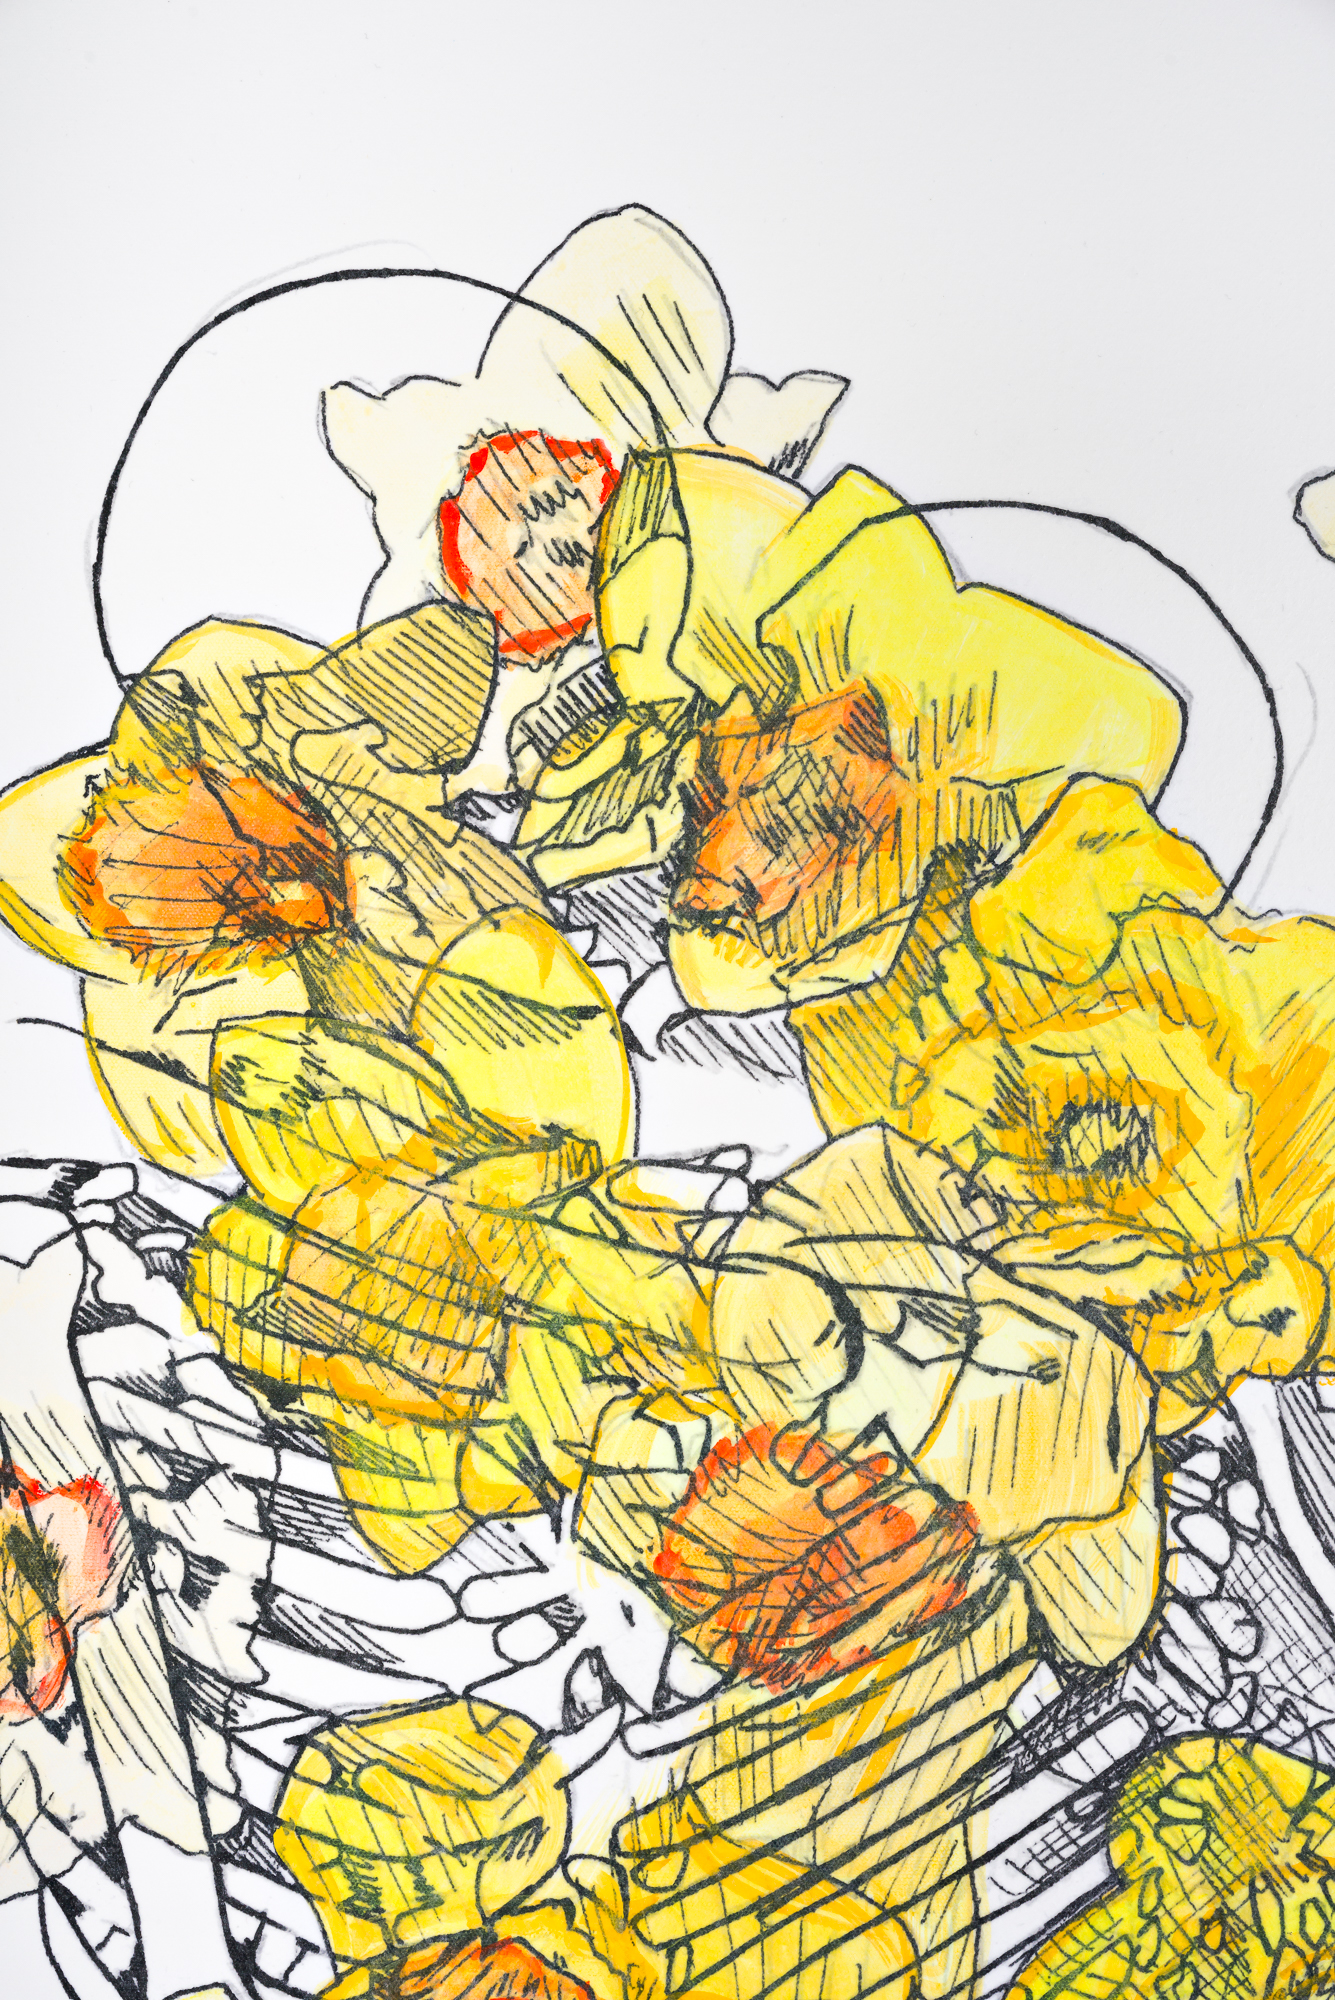 2019_03 - Mieke Marple-08.jpg